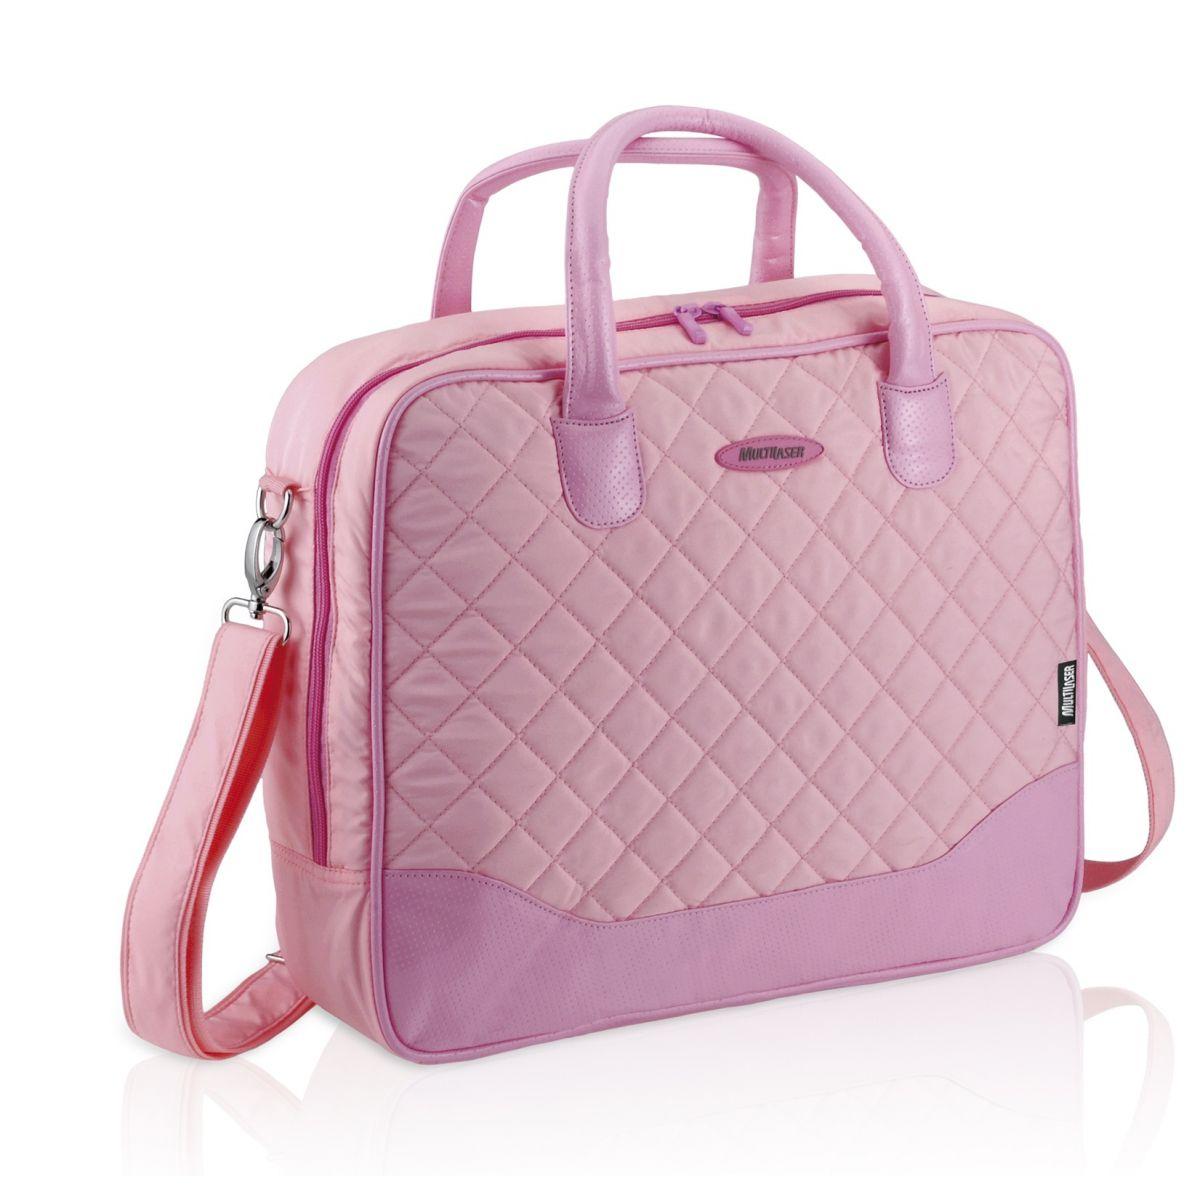 Bolsa Feminina Fashion Para Laptop BO025 - Multilaser